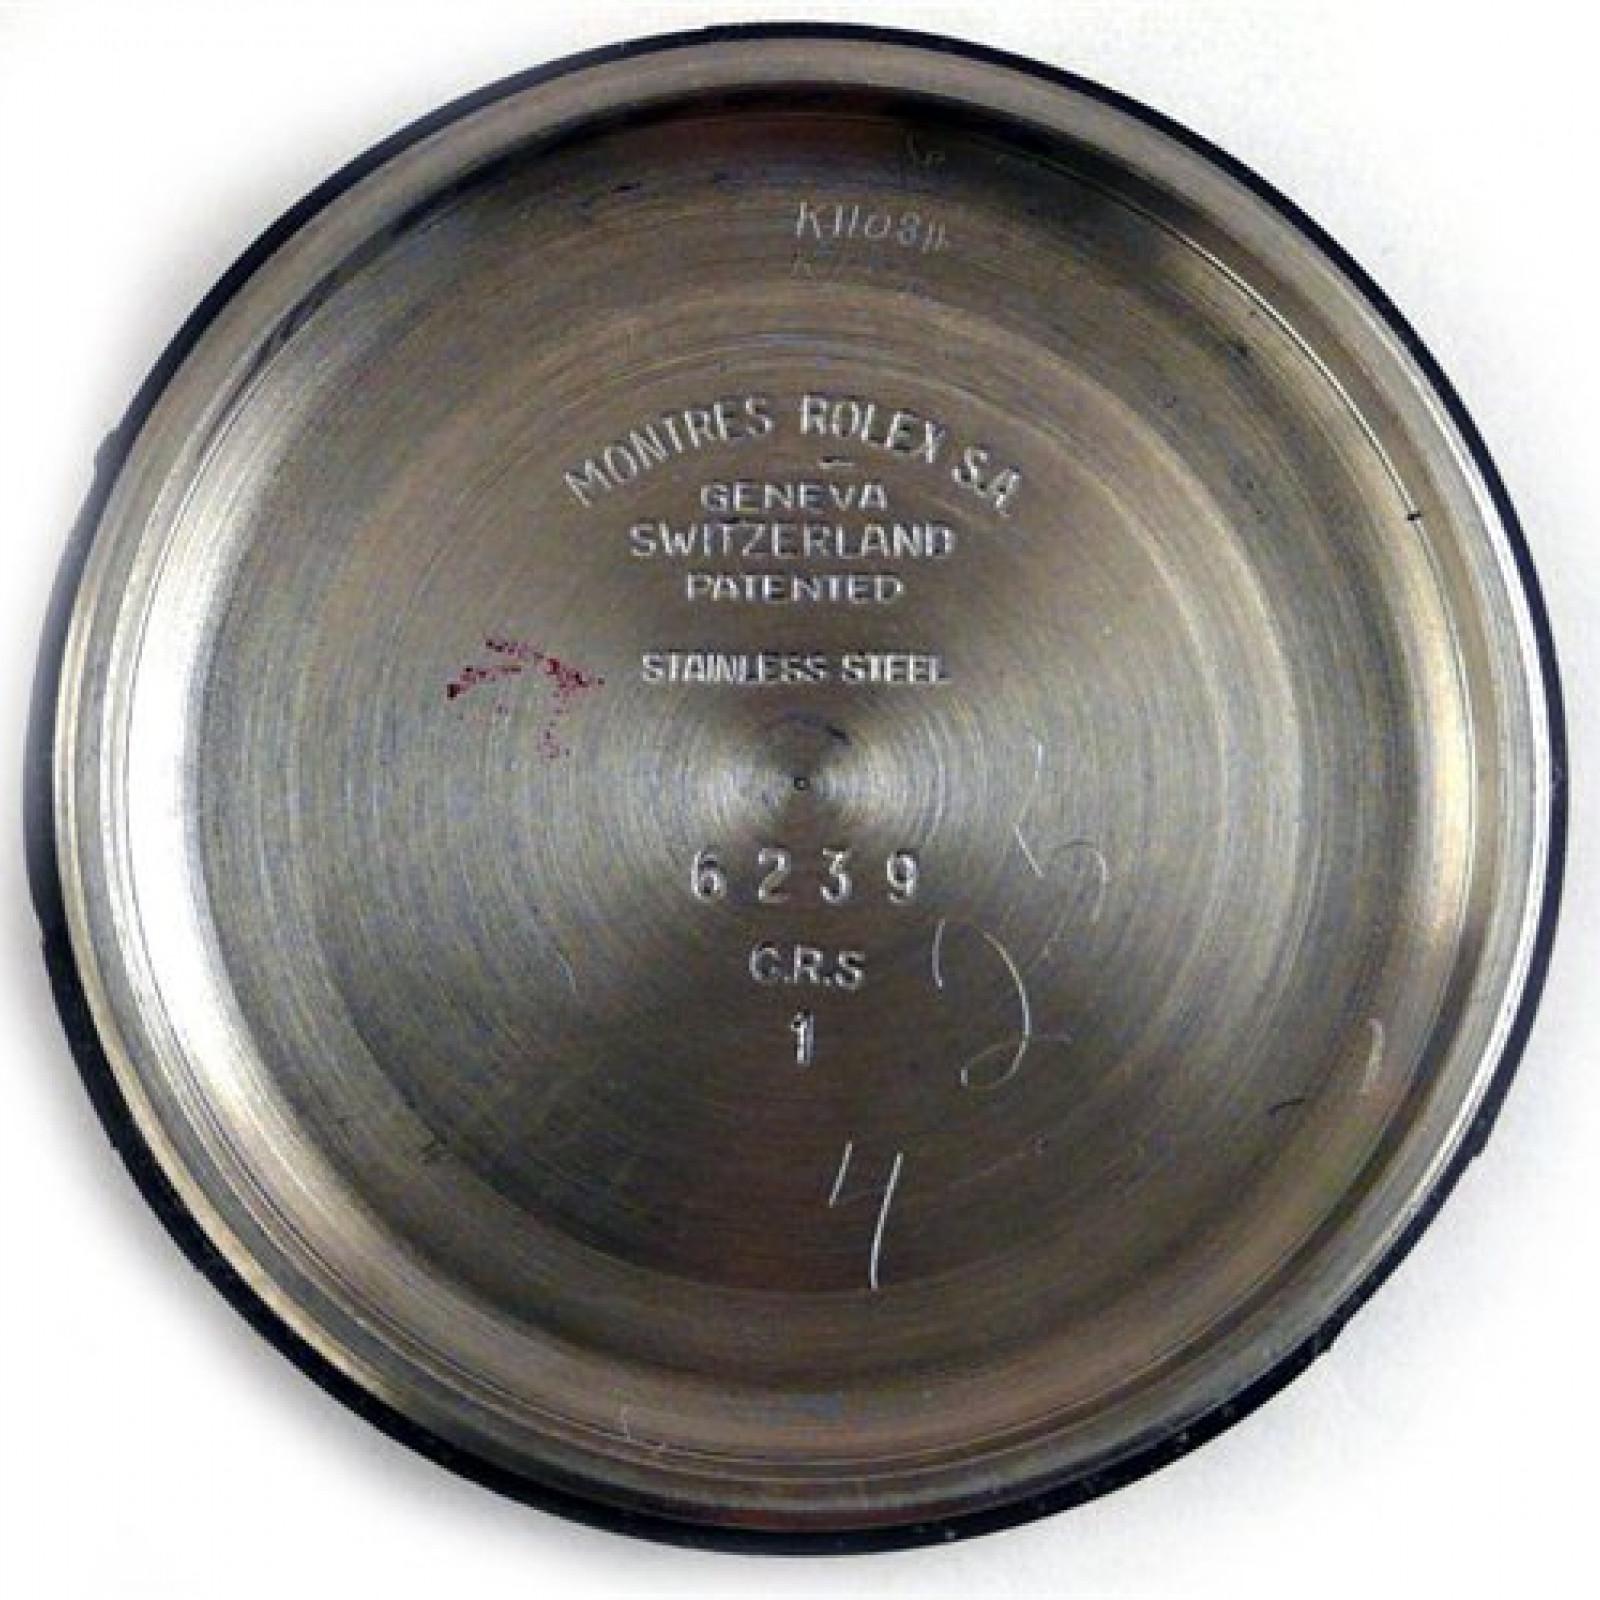 Vintage Rolex Daytona 6239 Steel with Black Dial